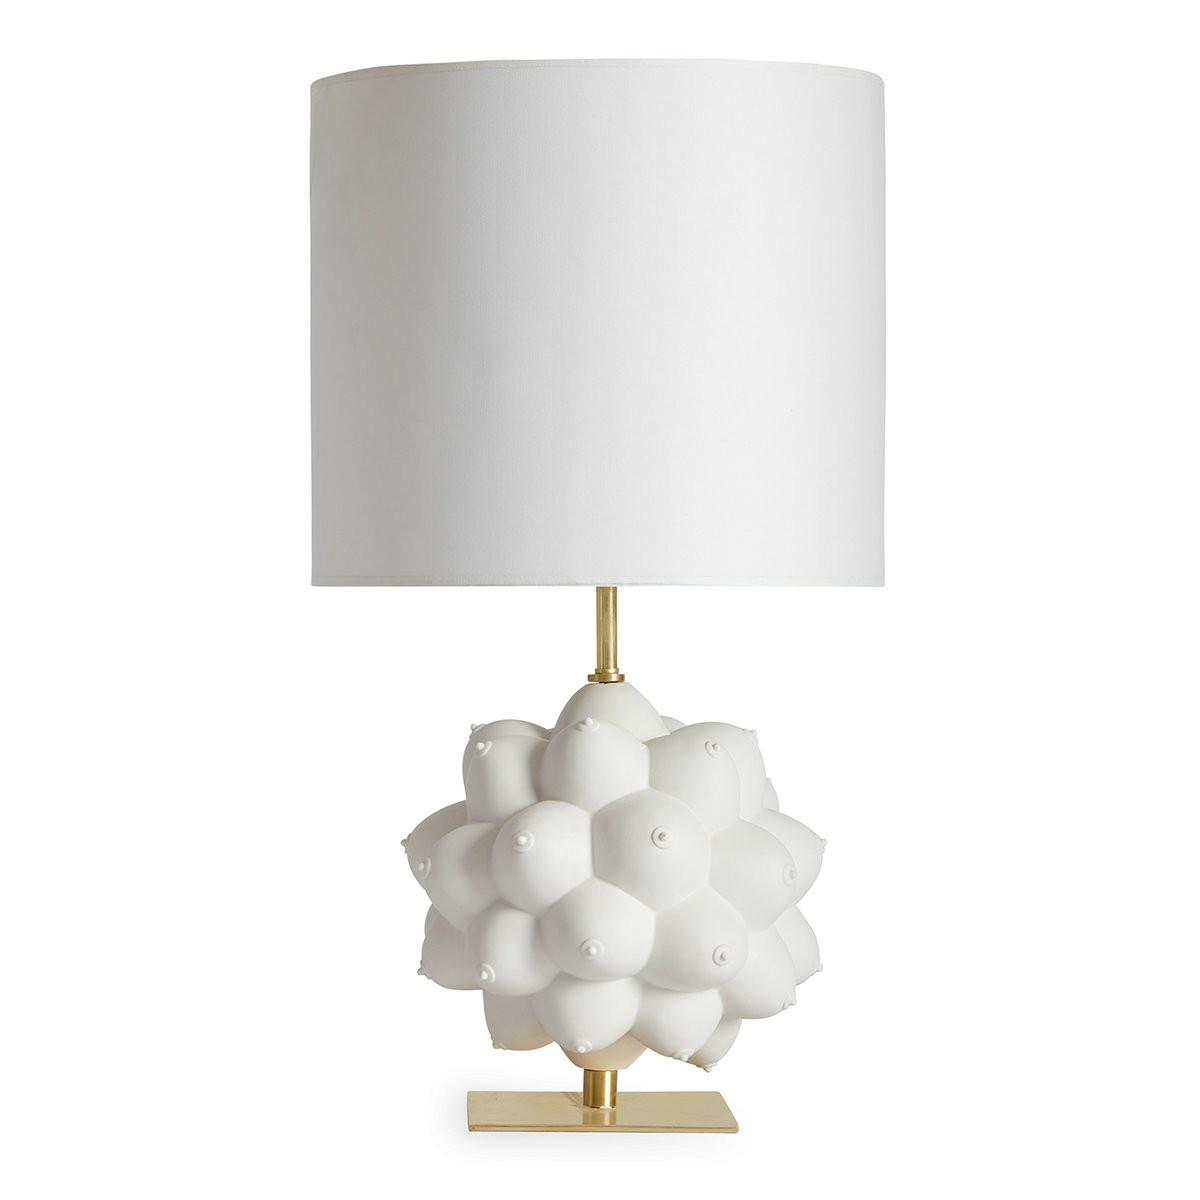 Jonathan Adler I Georgia Table Lamp